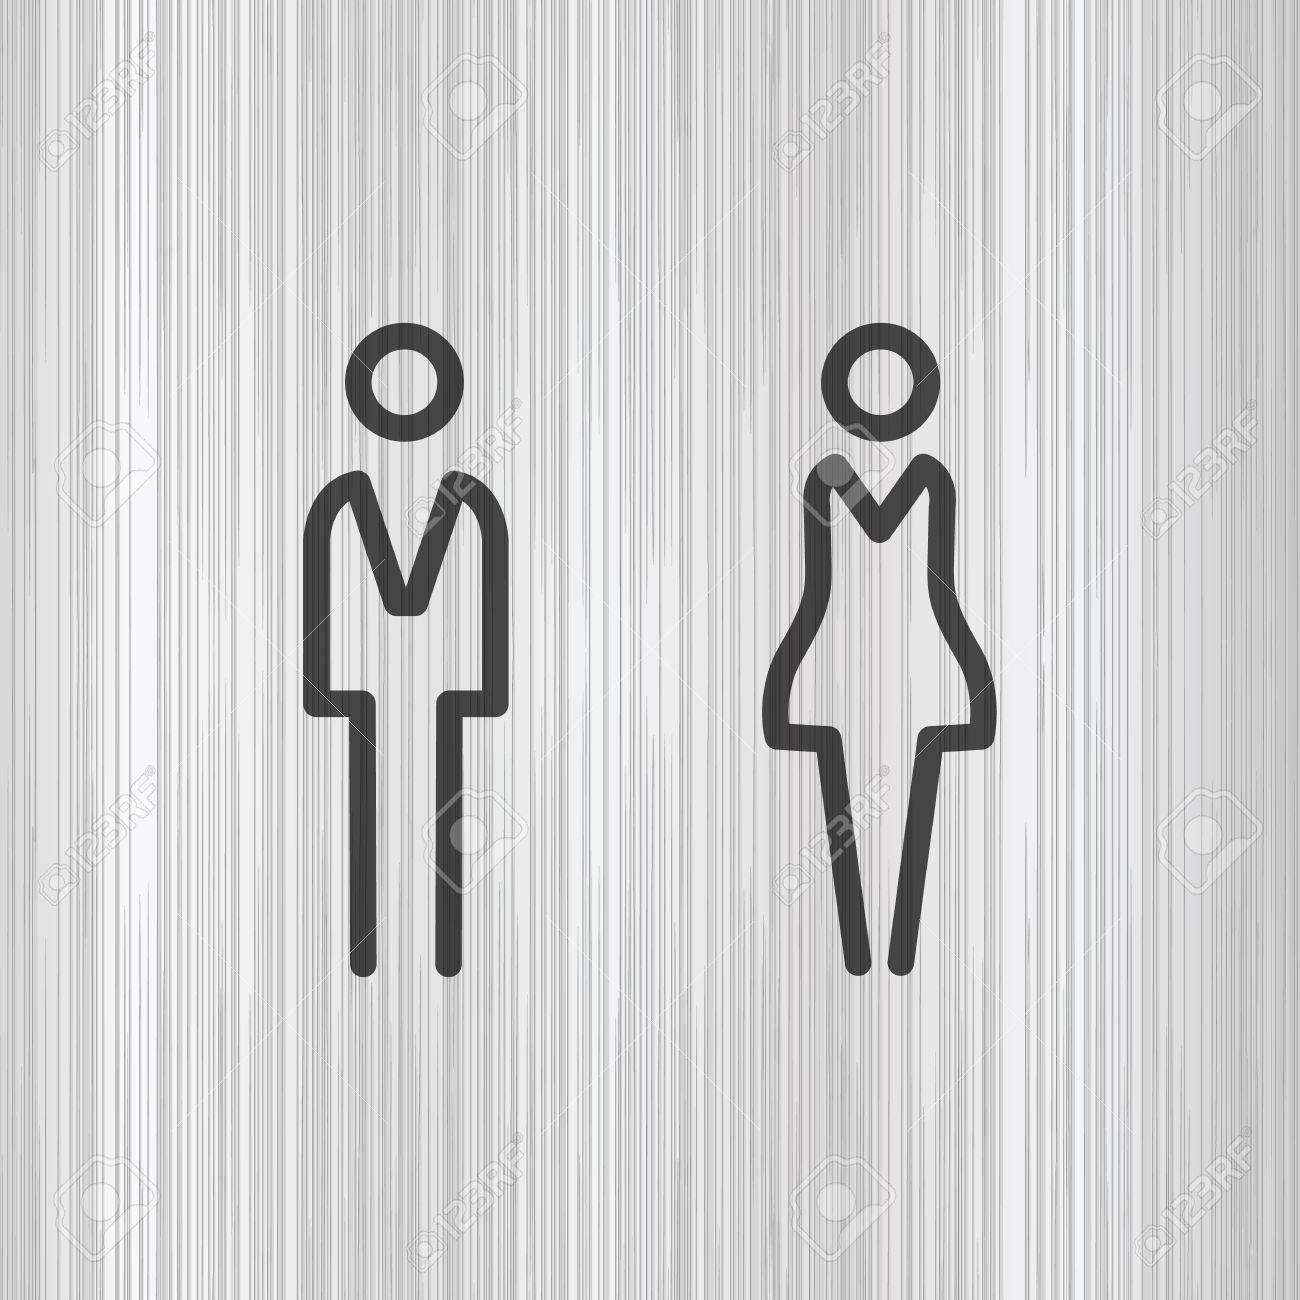 Toilet door / wall plate. Original WC icon. Sign. - 55146006